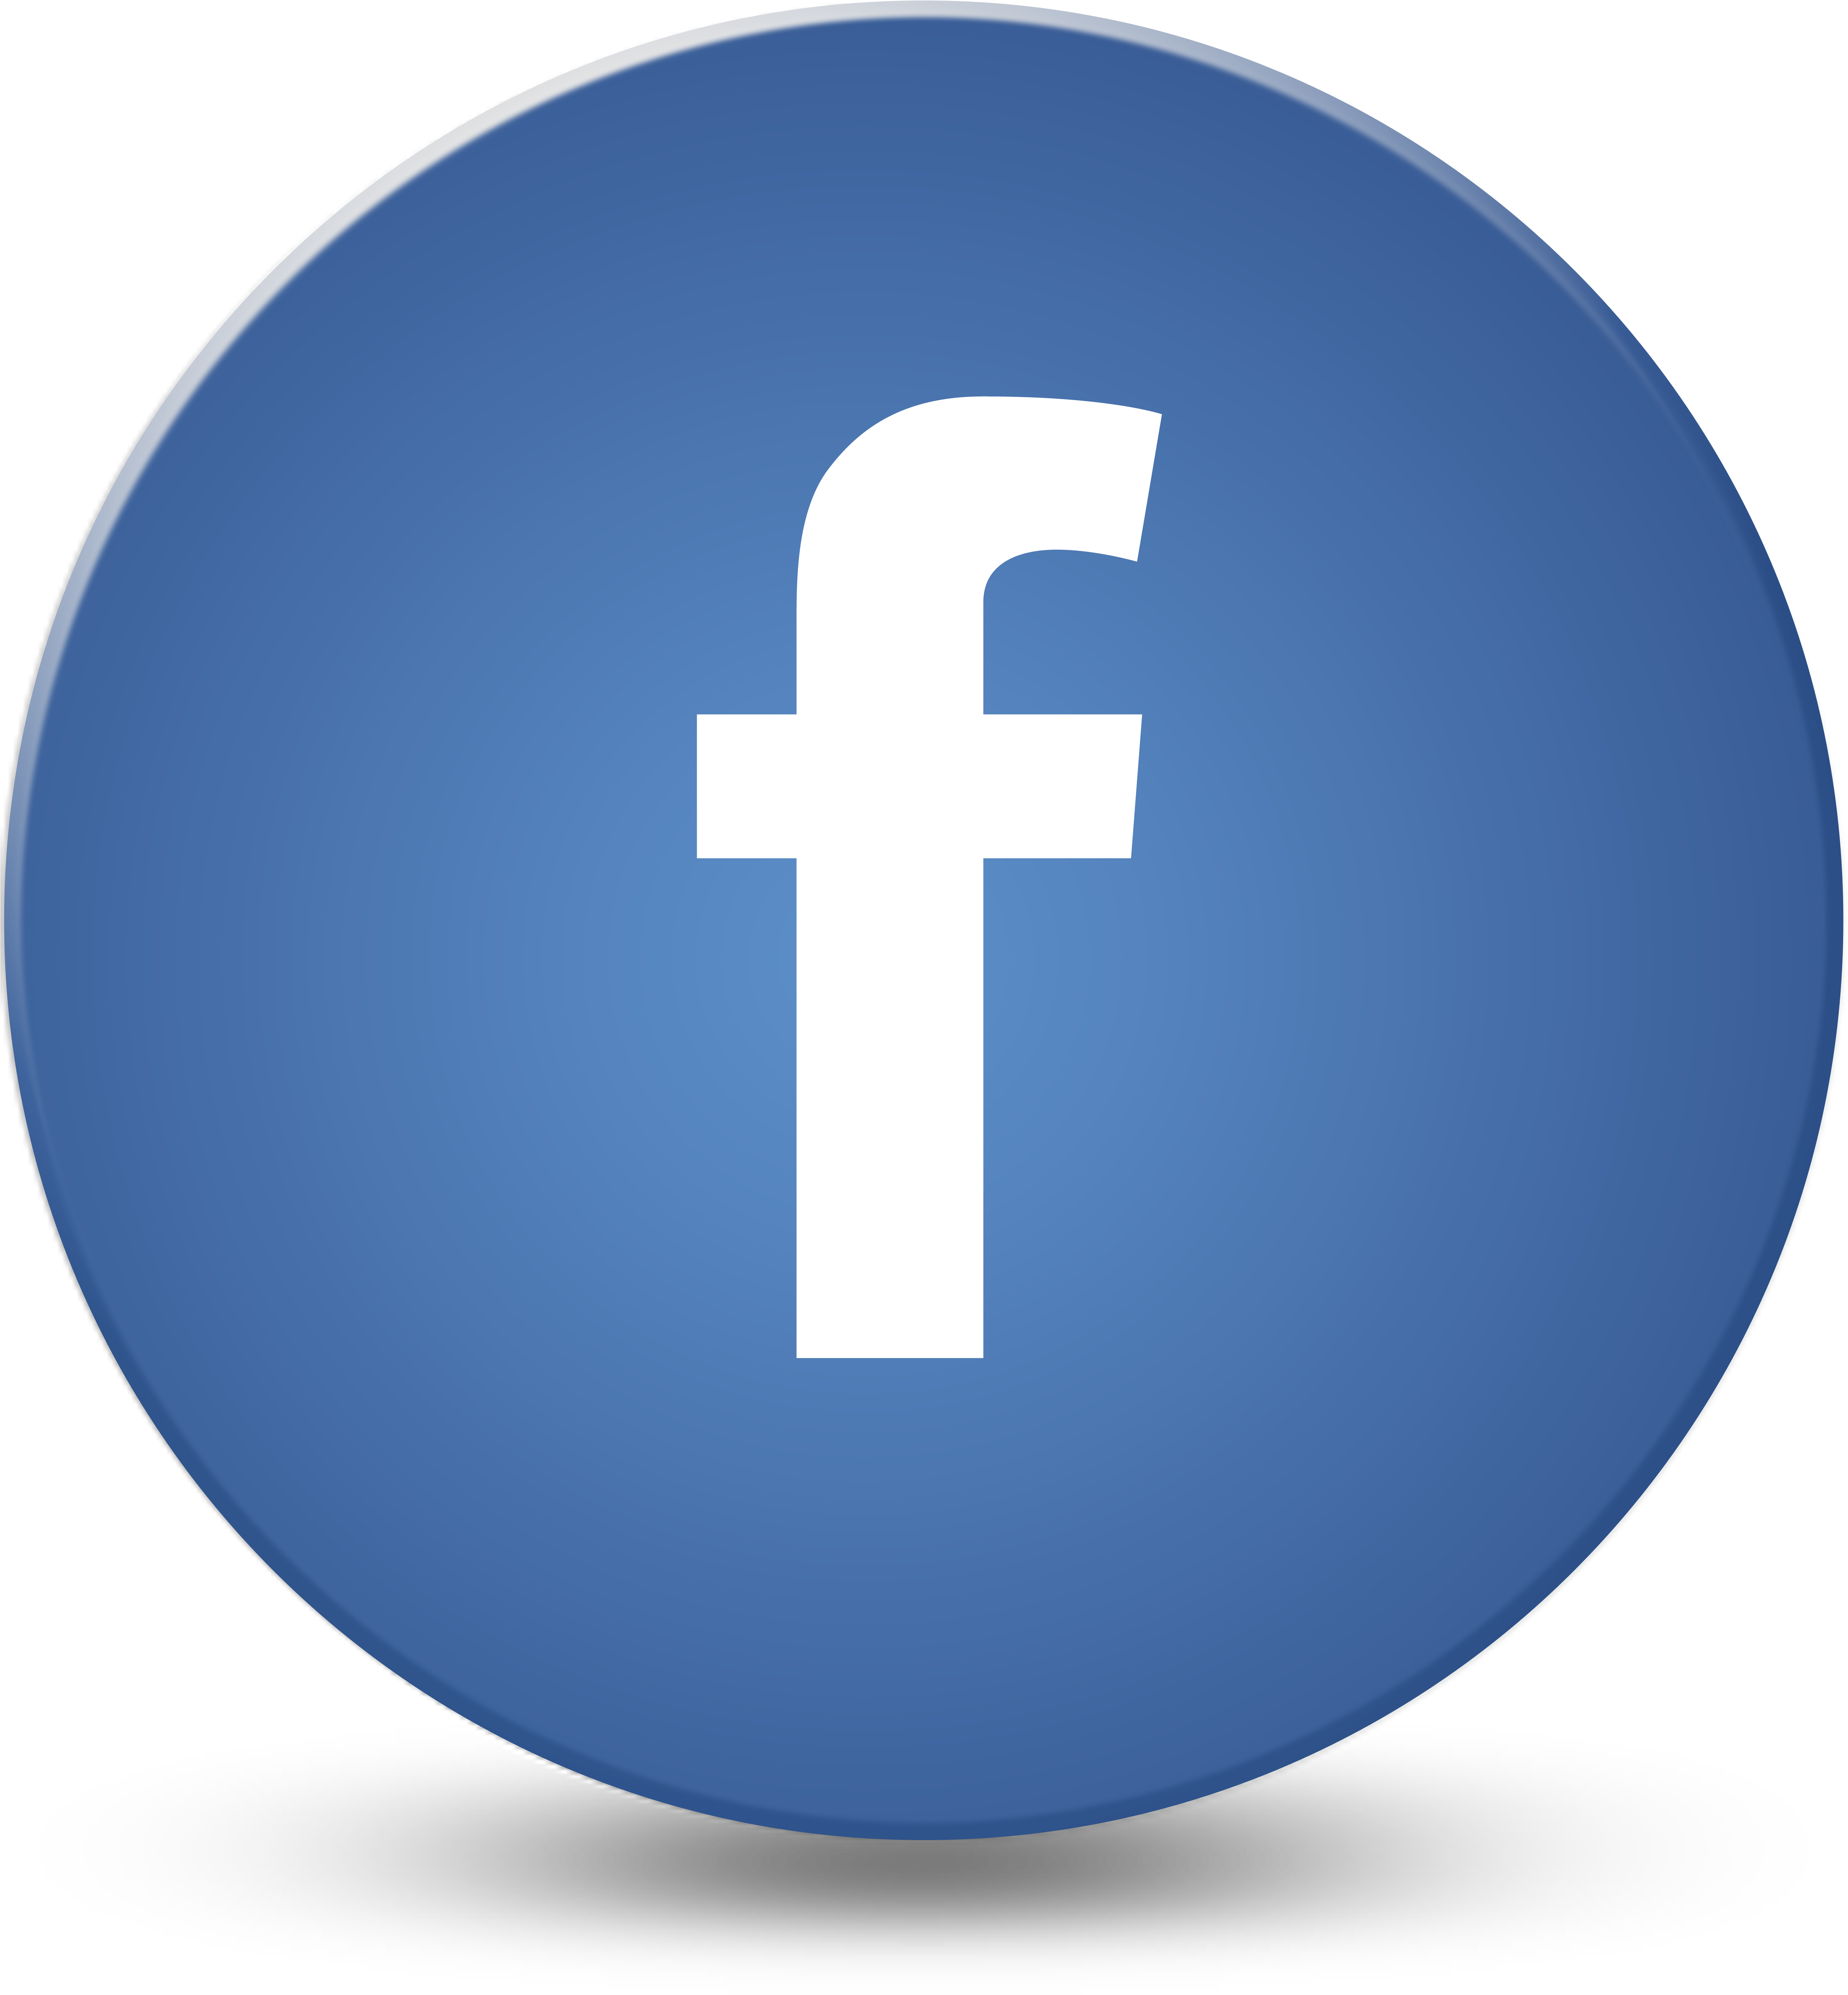 Группа Facebook